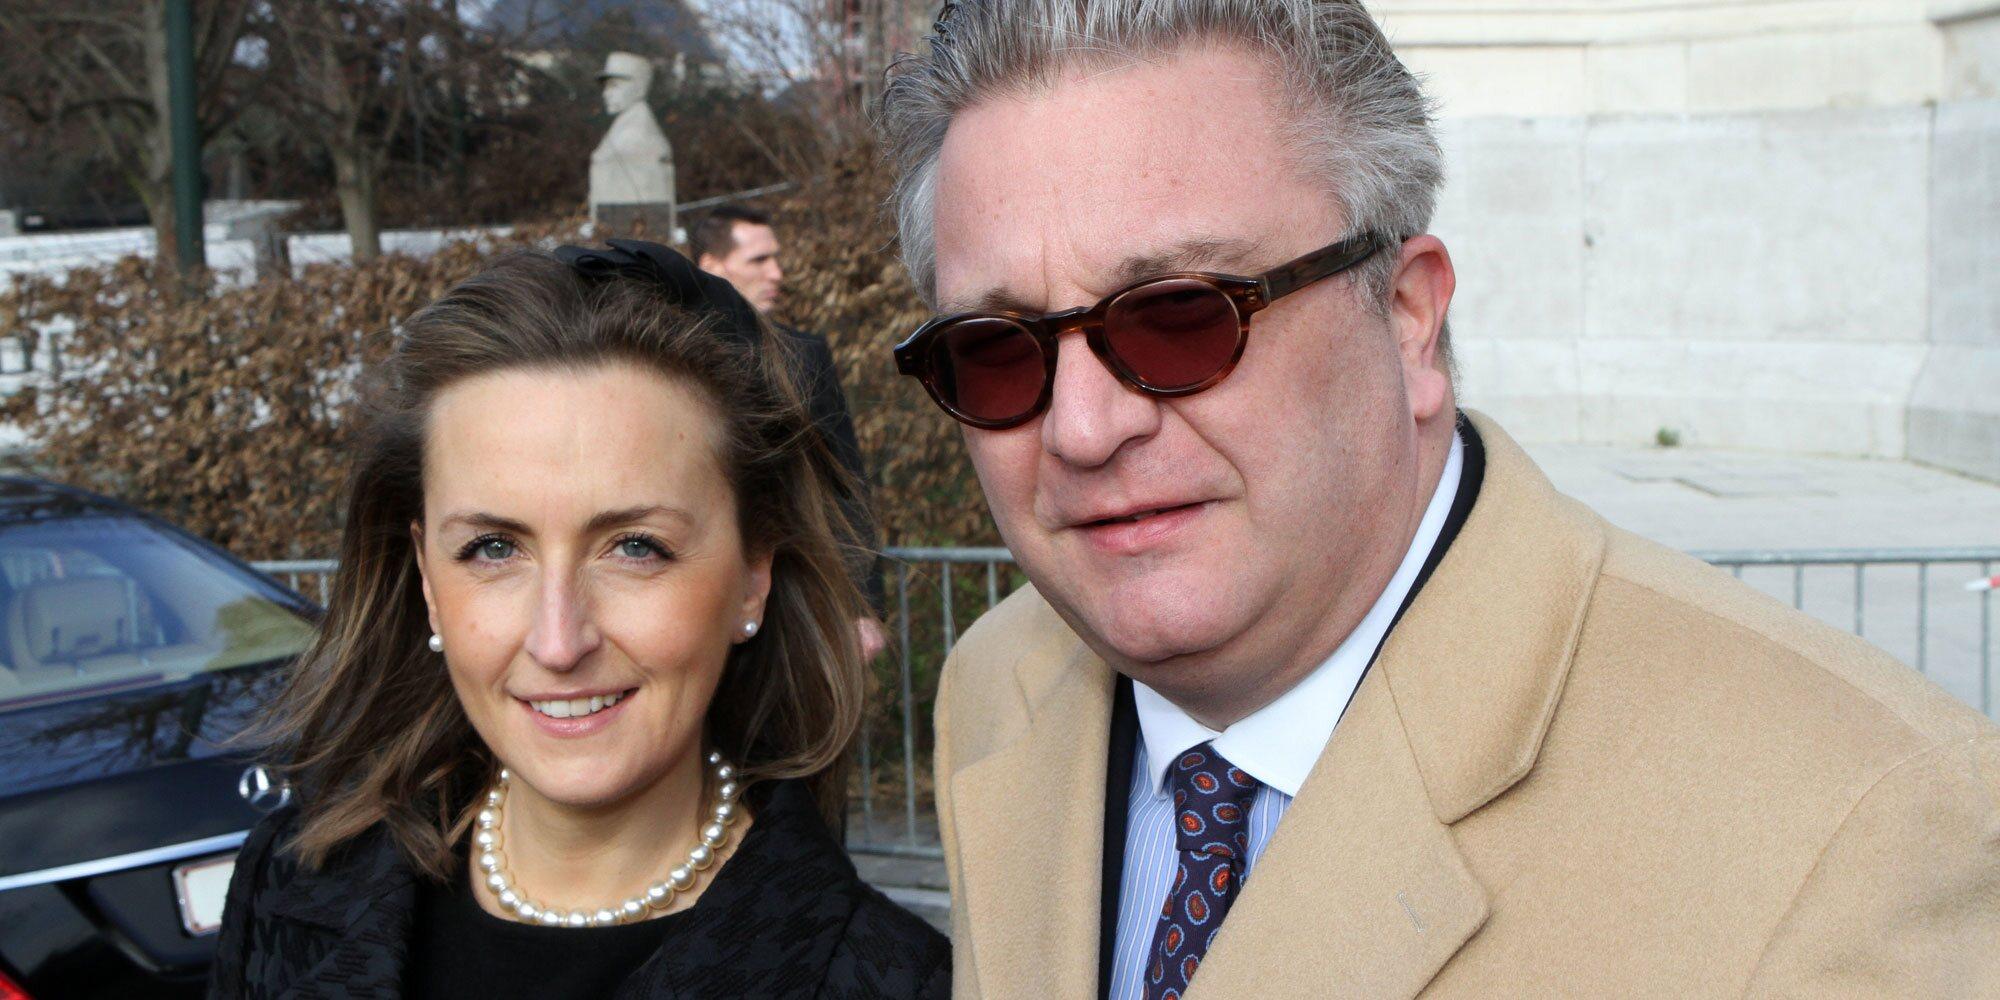 Laurent de Bélgica niega haberse separado de Claire de Bélgica